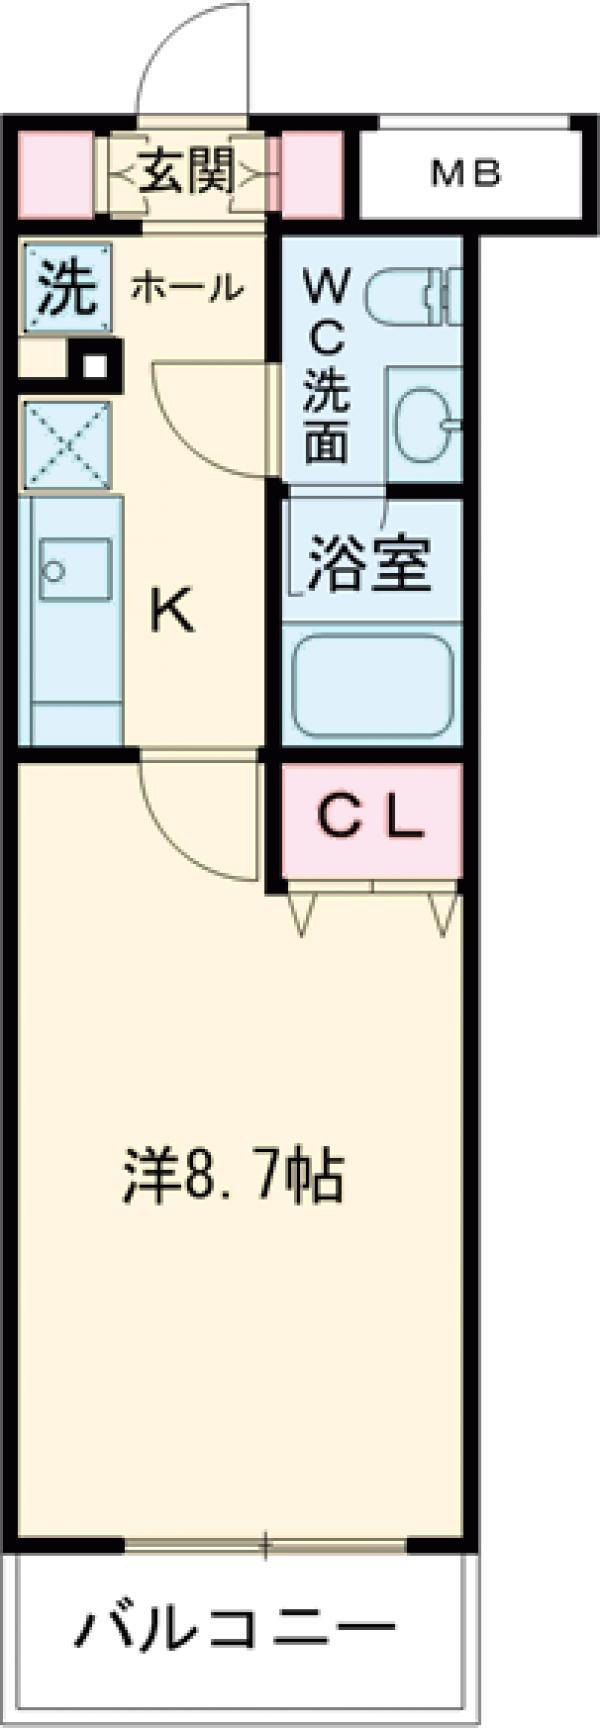 AZEST西高島平・105号室の間取り